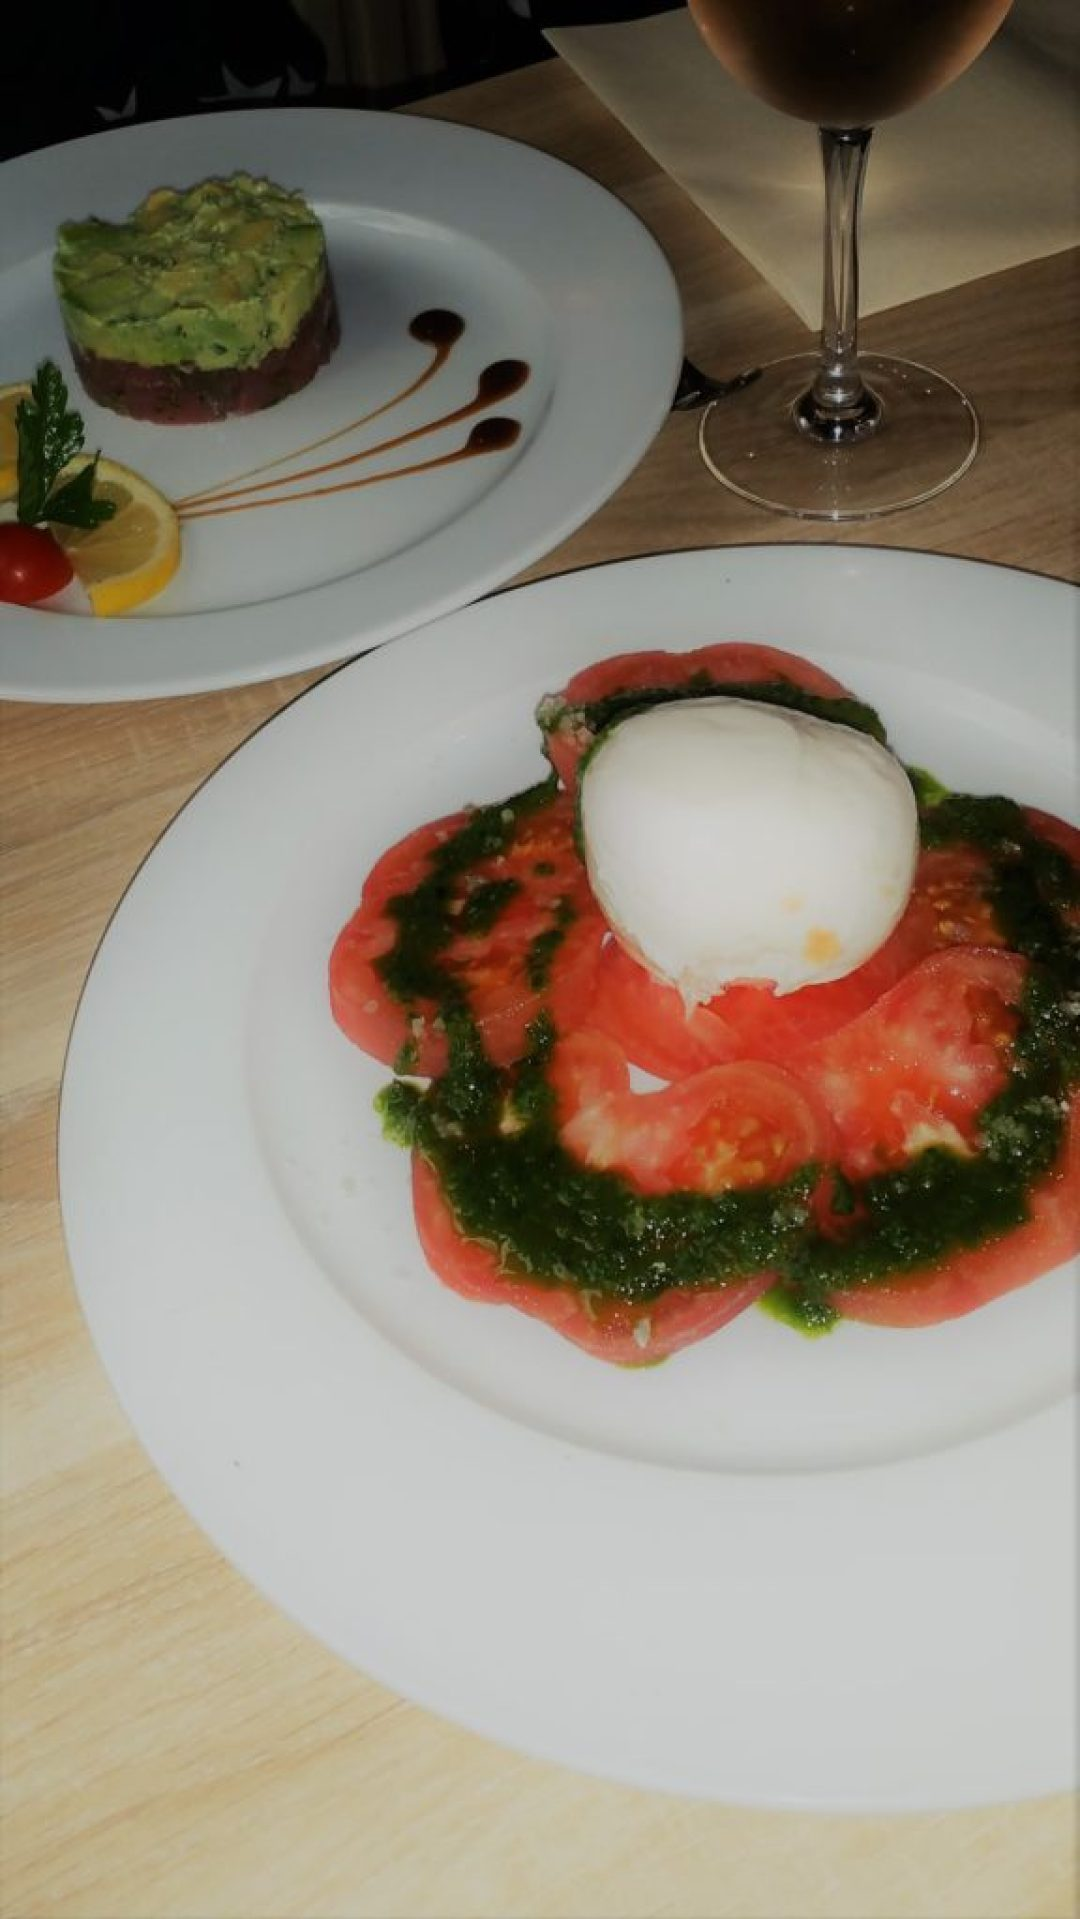 Mozzarella with tomato and pesto sauce & tuna with avocado sauce, LE III, Paris